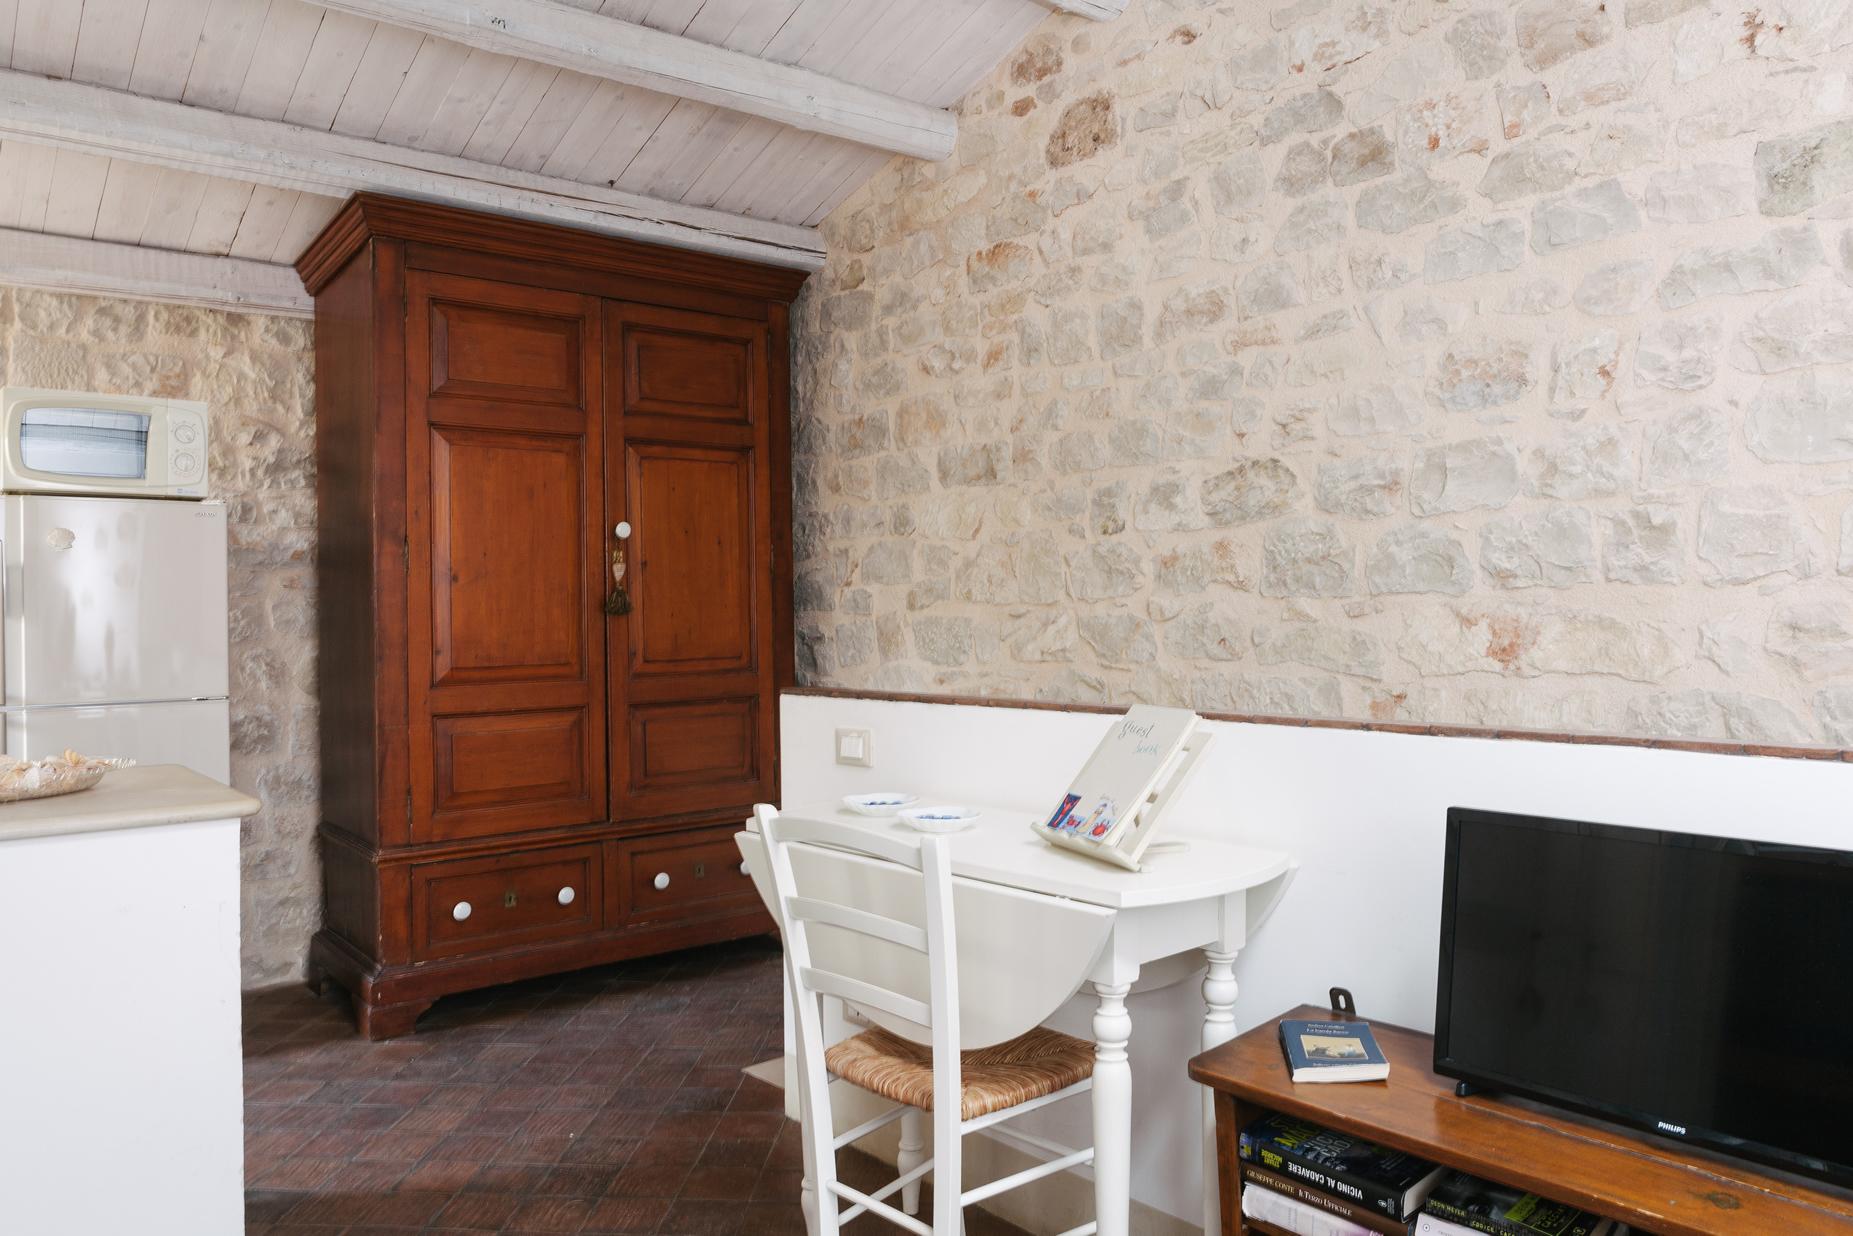 17sampieri-casa-vacanze-sicilia-appartamento-sicily-holiday-apartment-casa-di-pietra-italia-italy.jpg